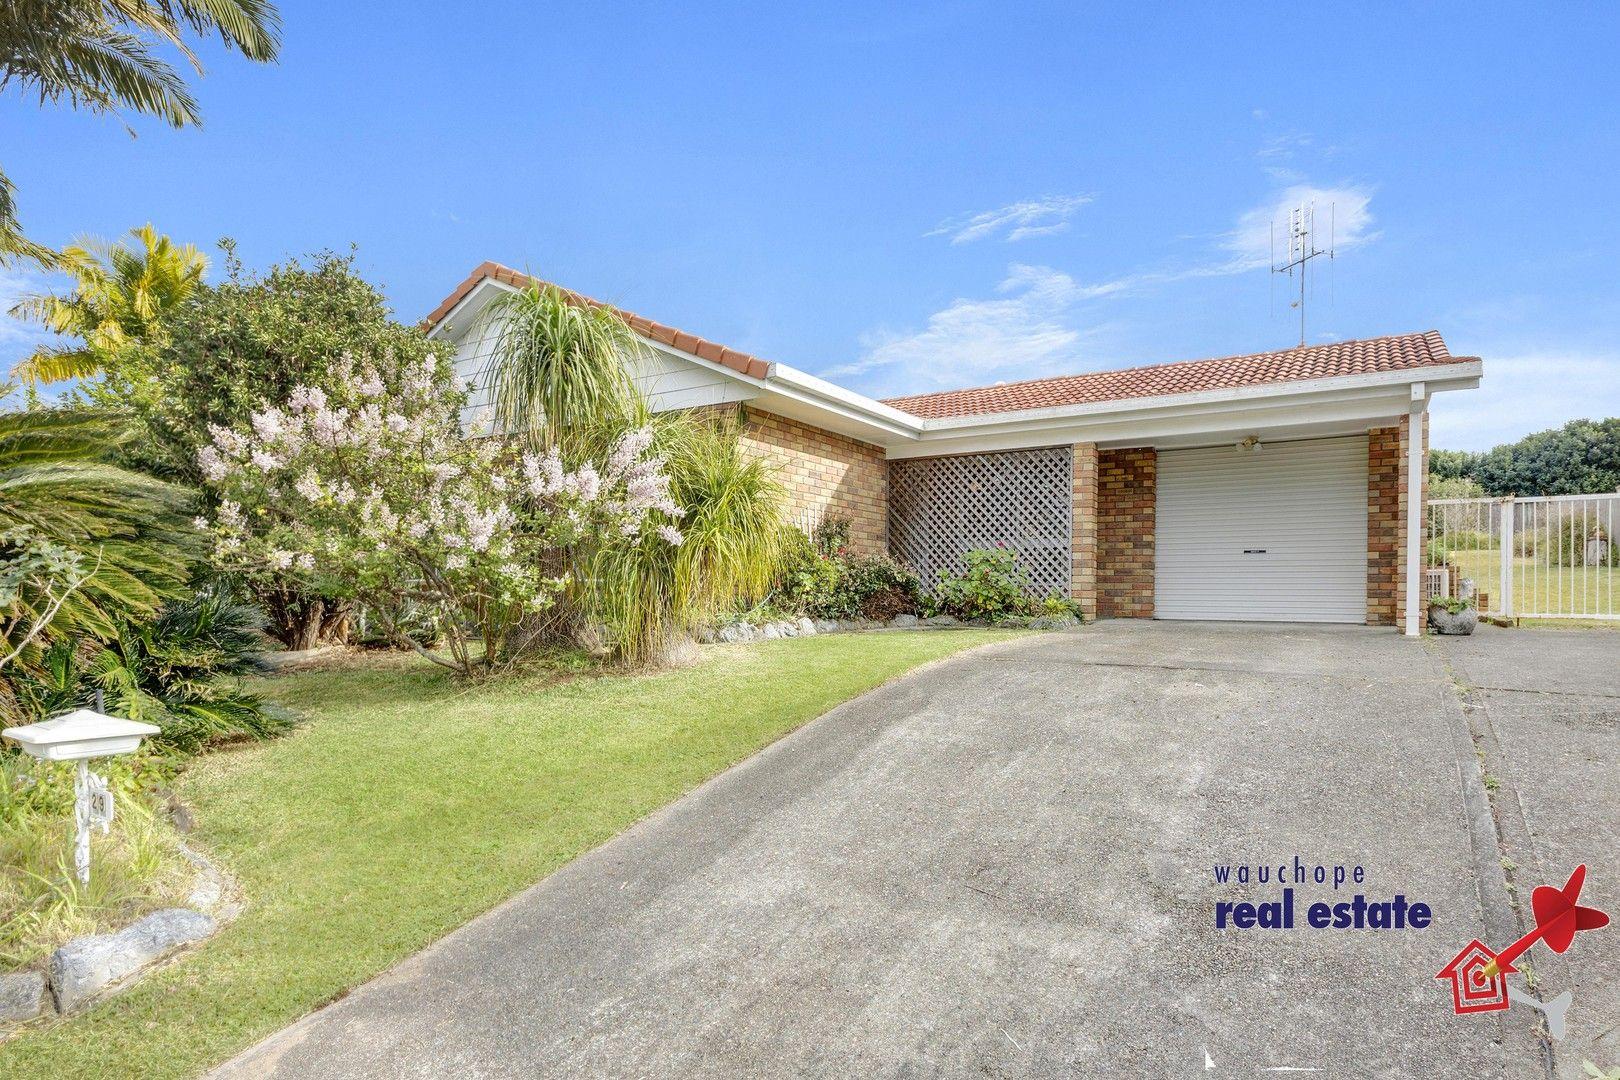 29 Cedar Close, Wauchope NSW 2446, Image 0